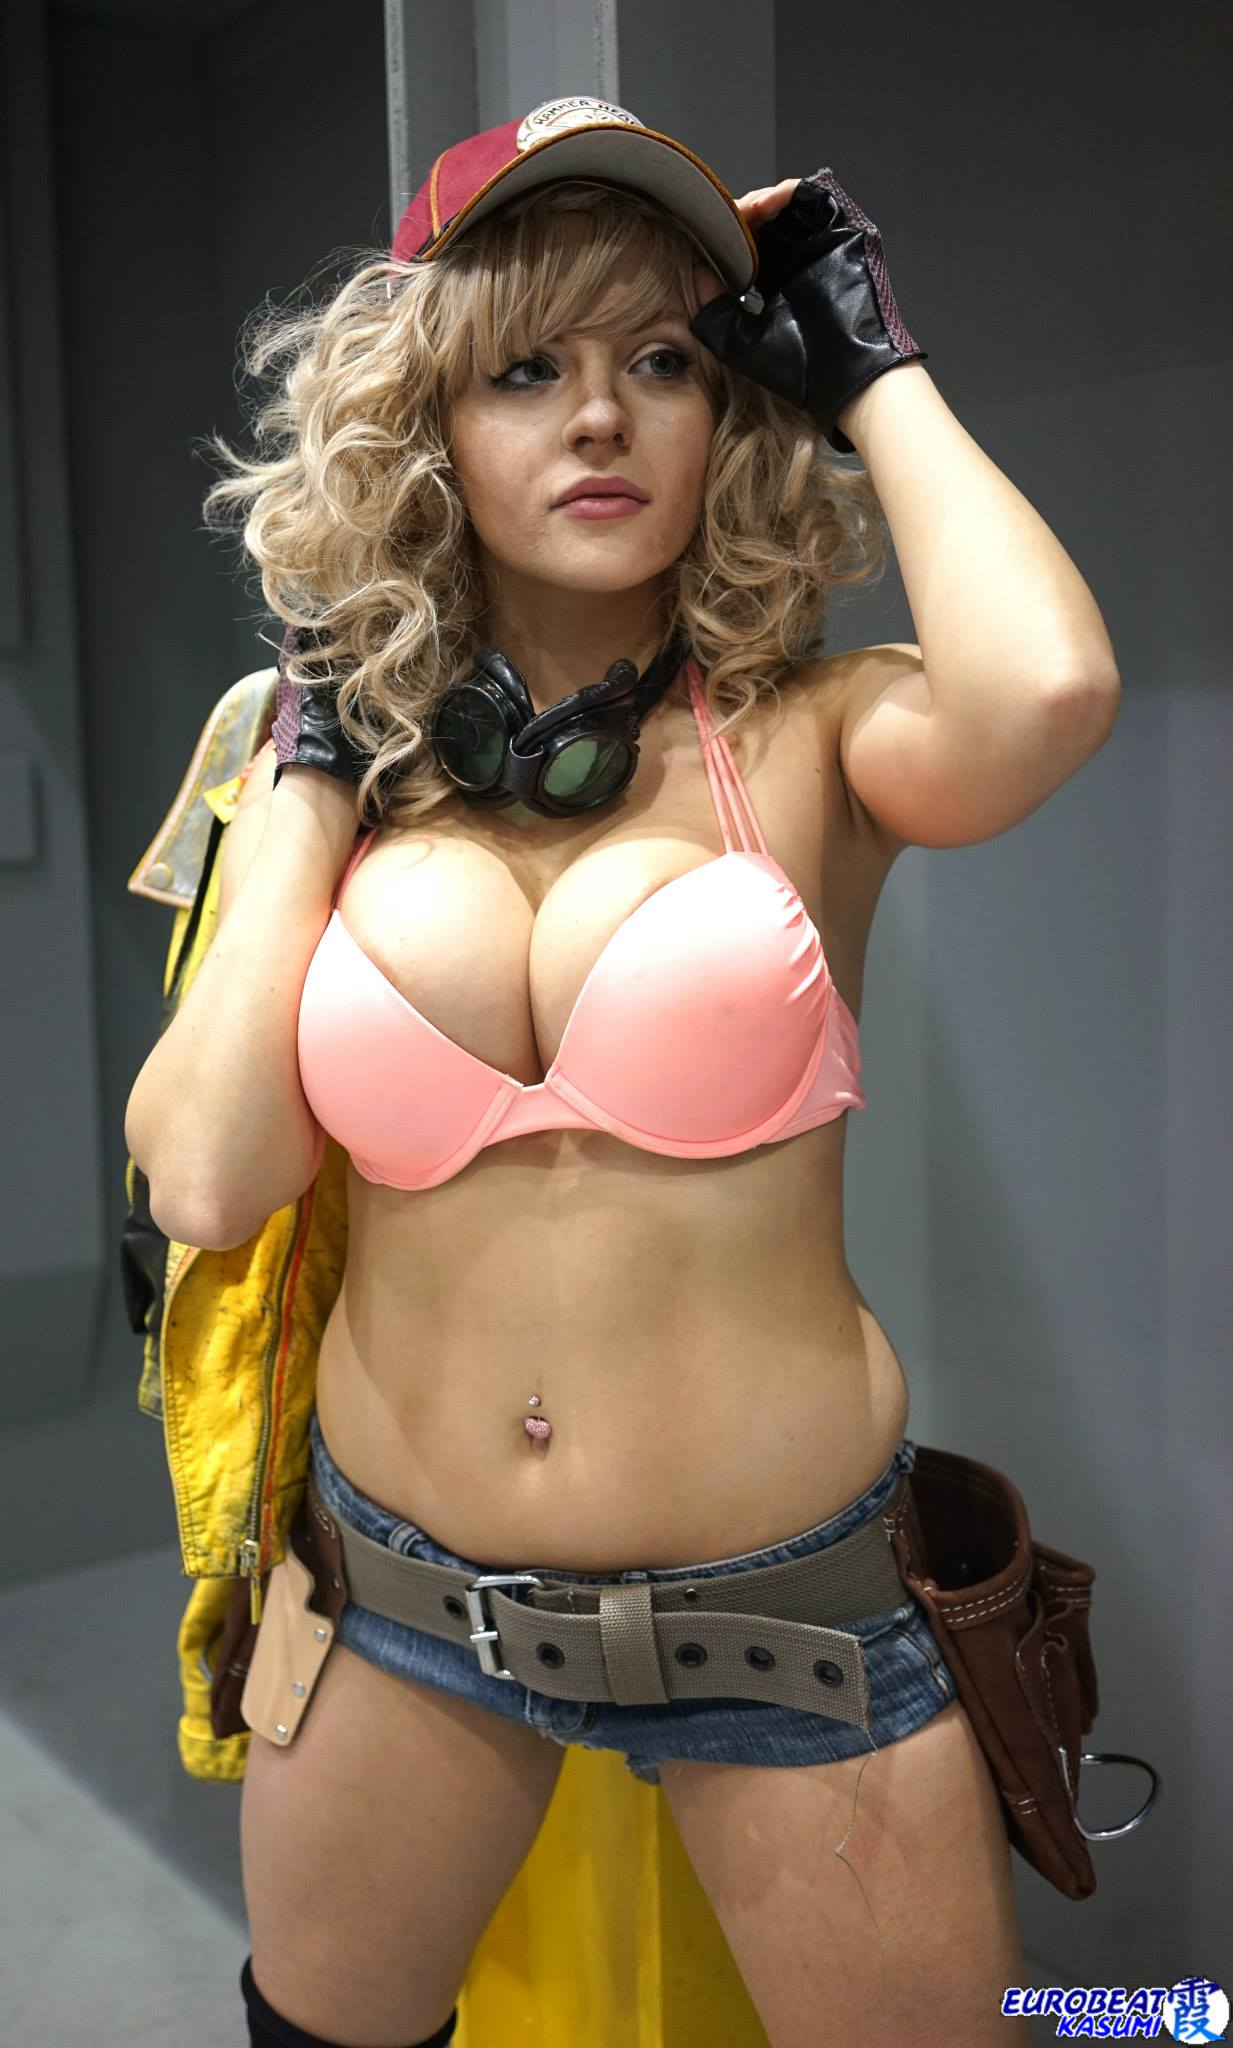 Freeadultporn sexy photo